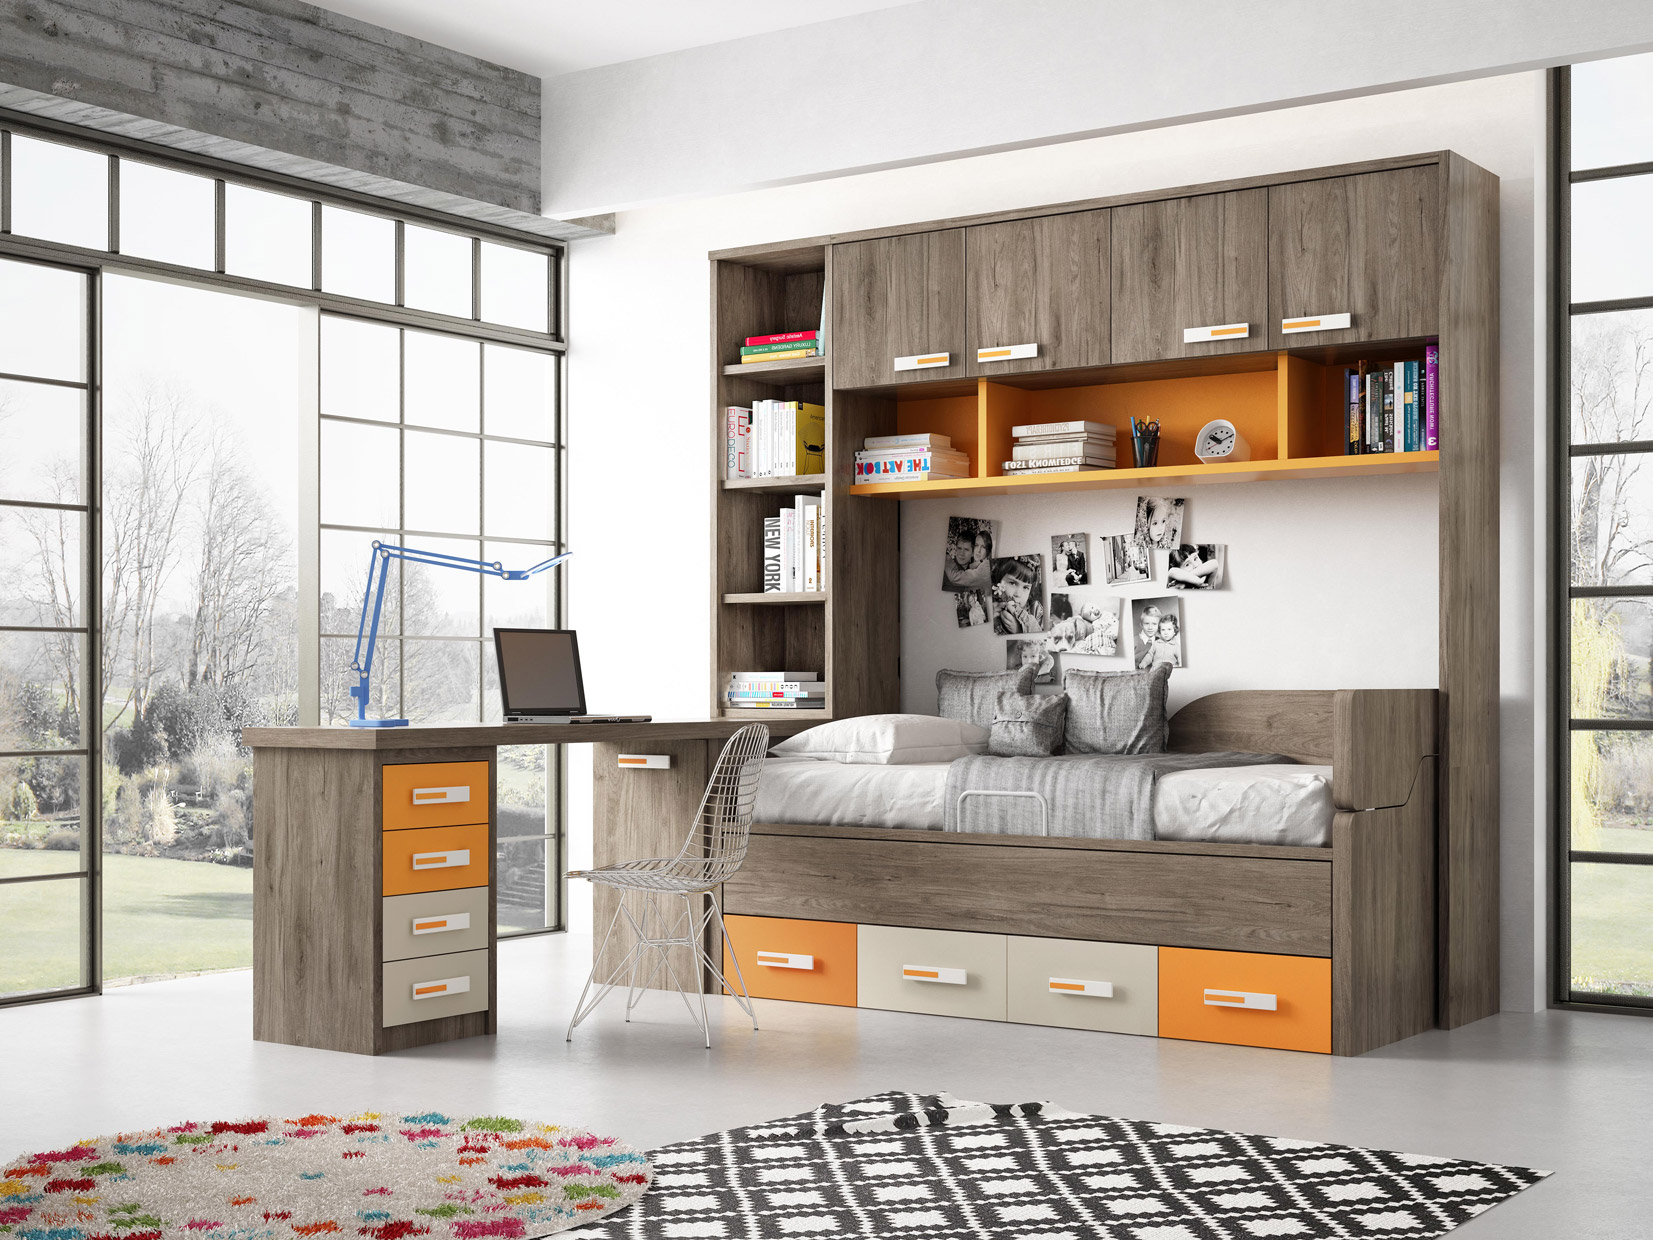 Dormitorio Juvenil Toscana. - Muebles DíazMuebles Díaz